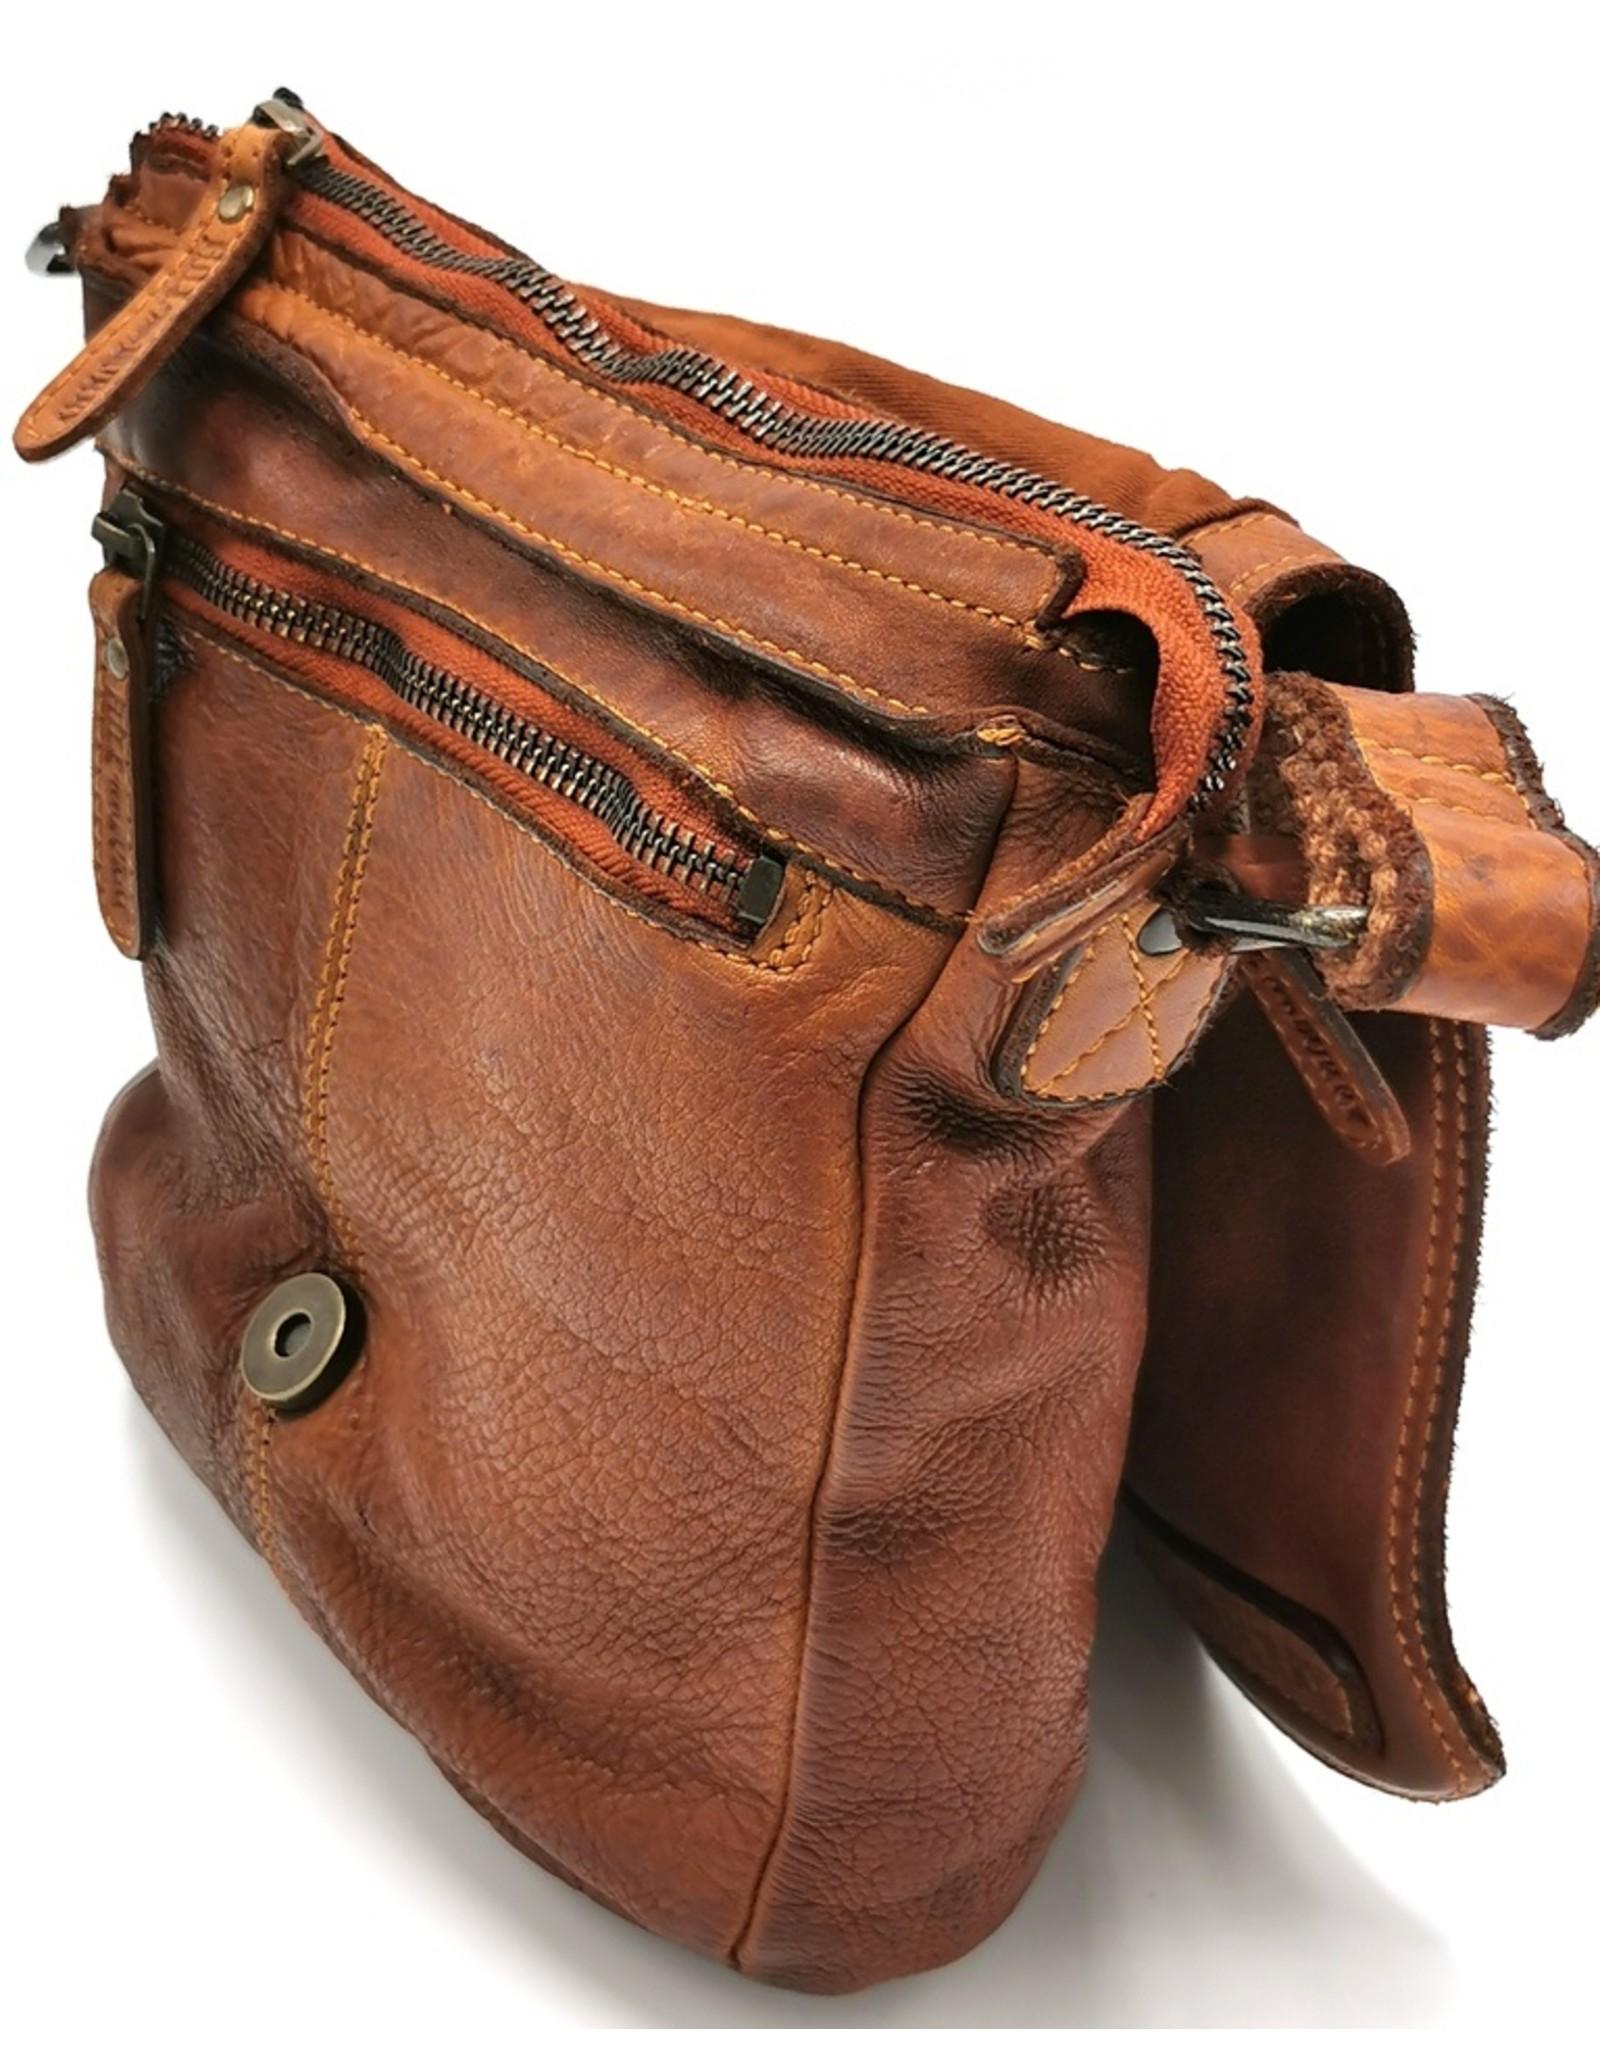 HillBurry Leather bags - HillBurry leather shoulder bag 6212c